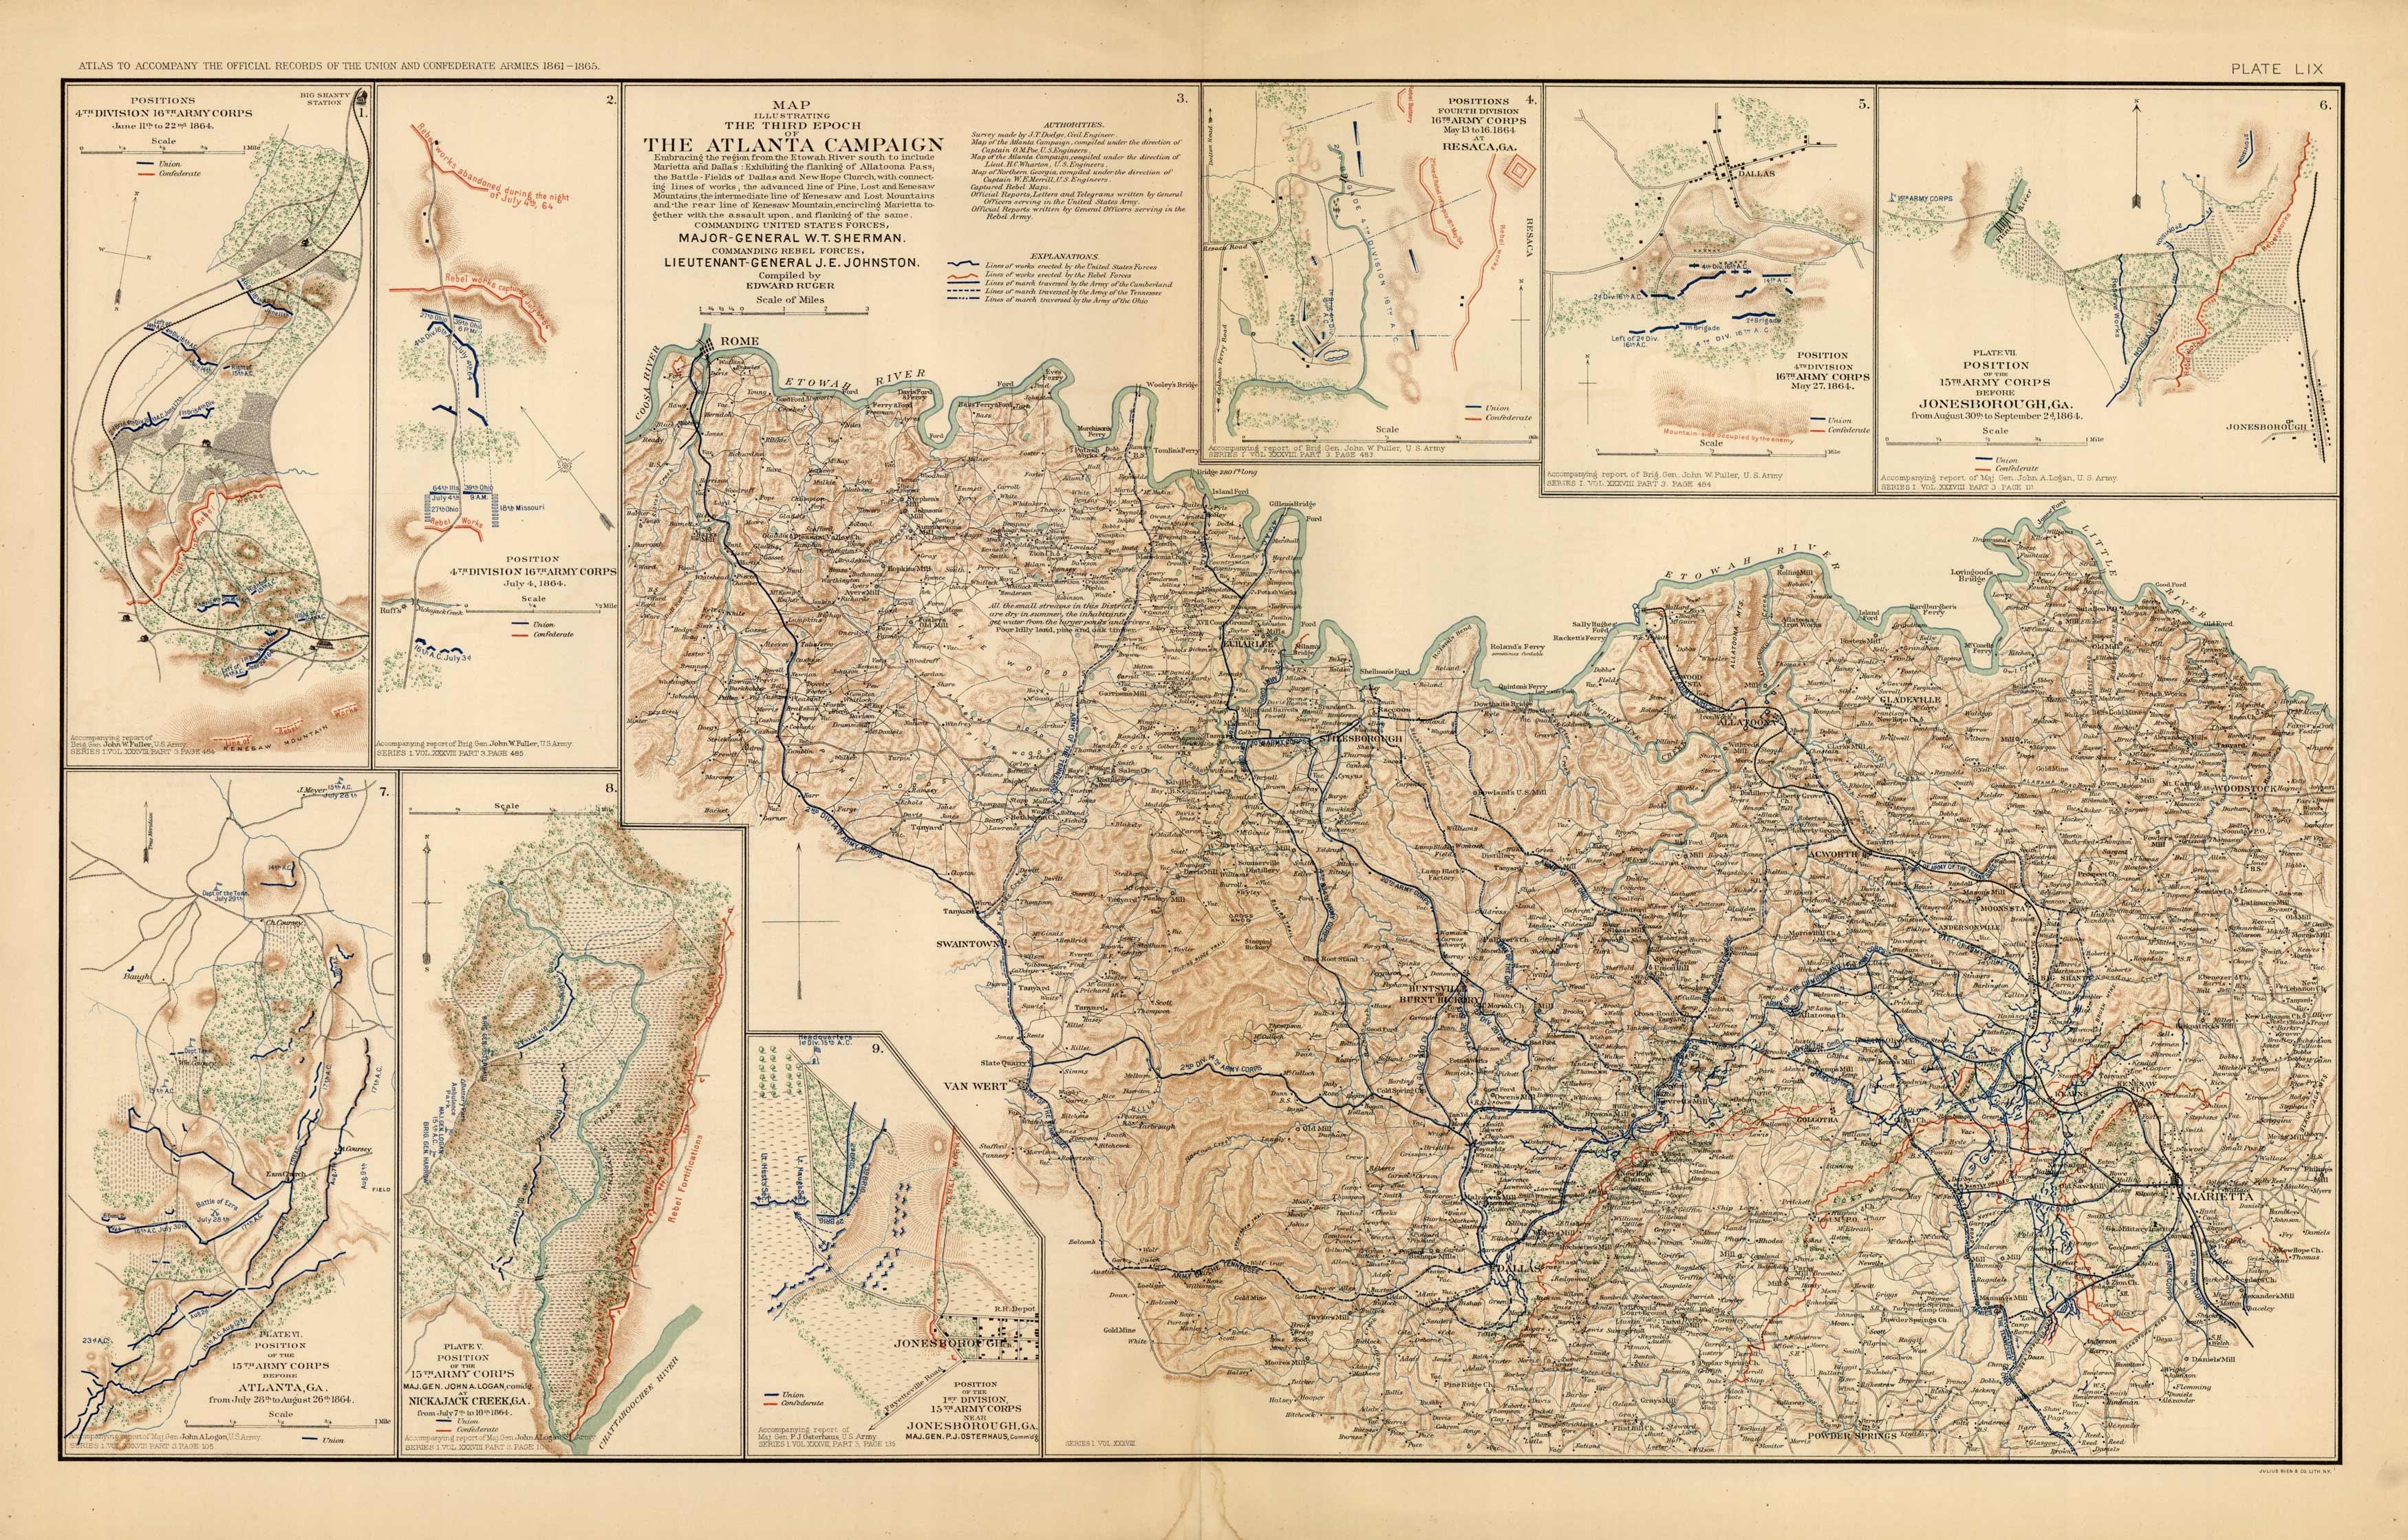 Civil War Atlas; Plate 59; Maps of Atlanta Campaign